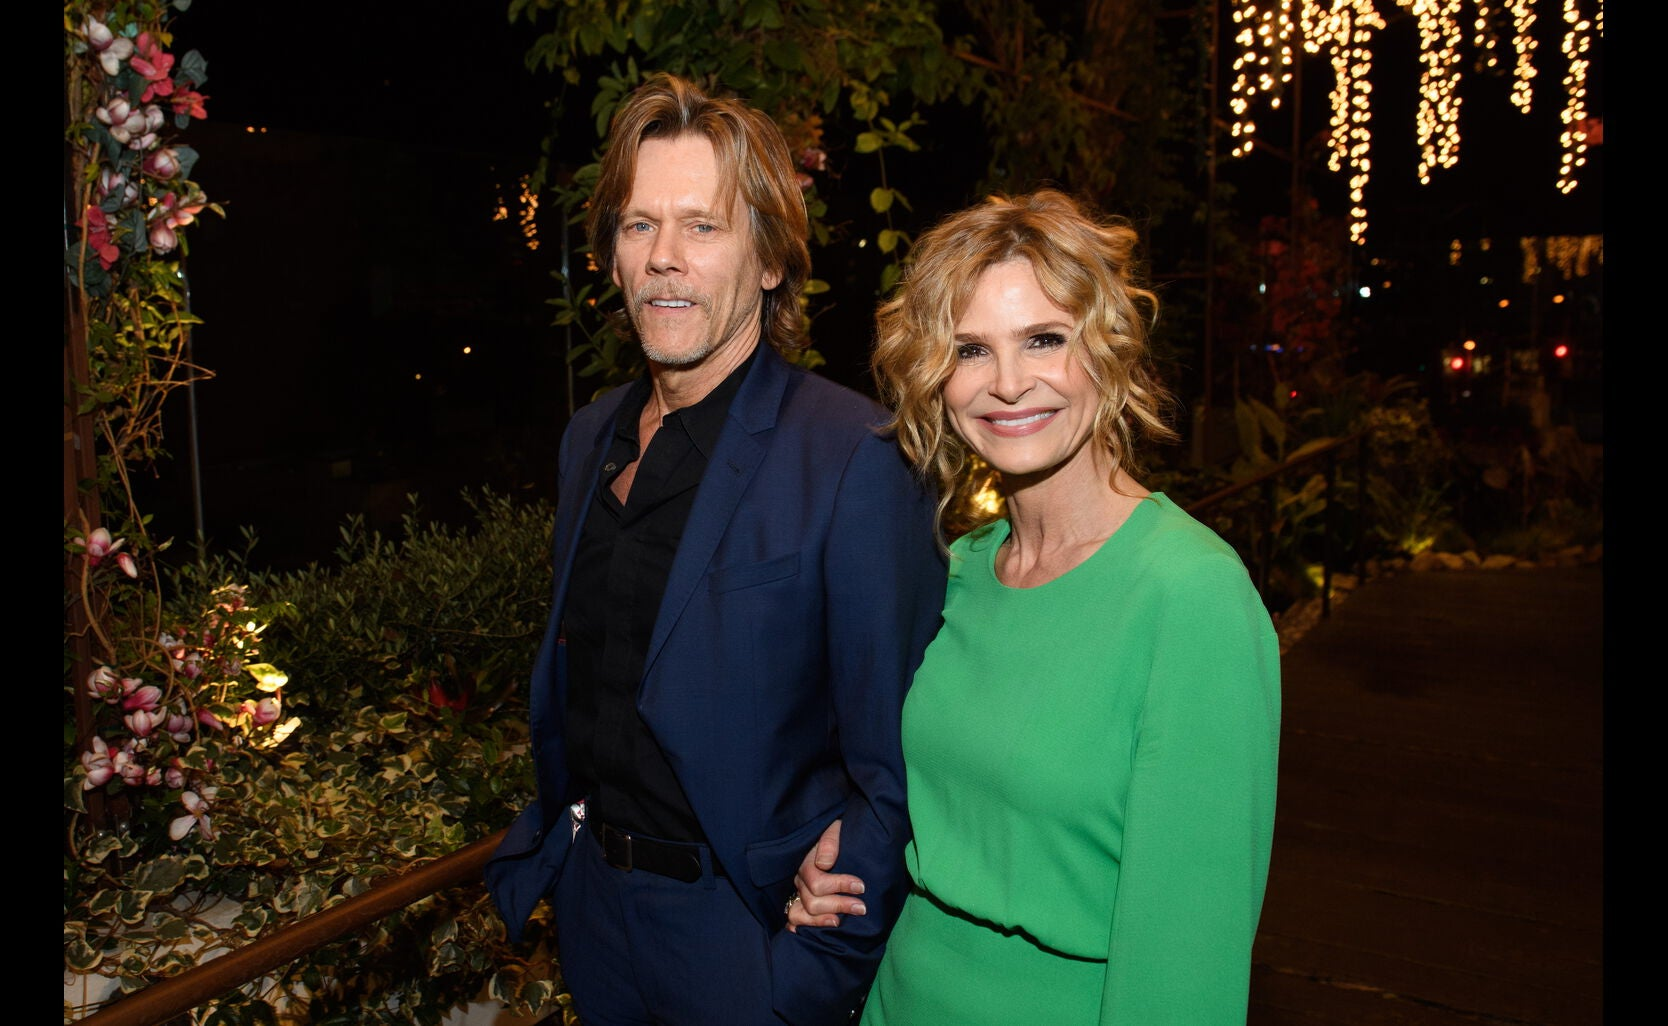 Actors Kevin Bacon and Kyra Sedgwick at the Golden Globe Ambassador event